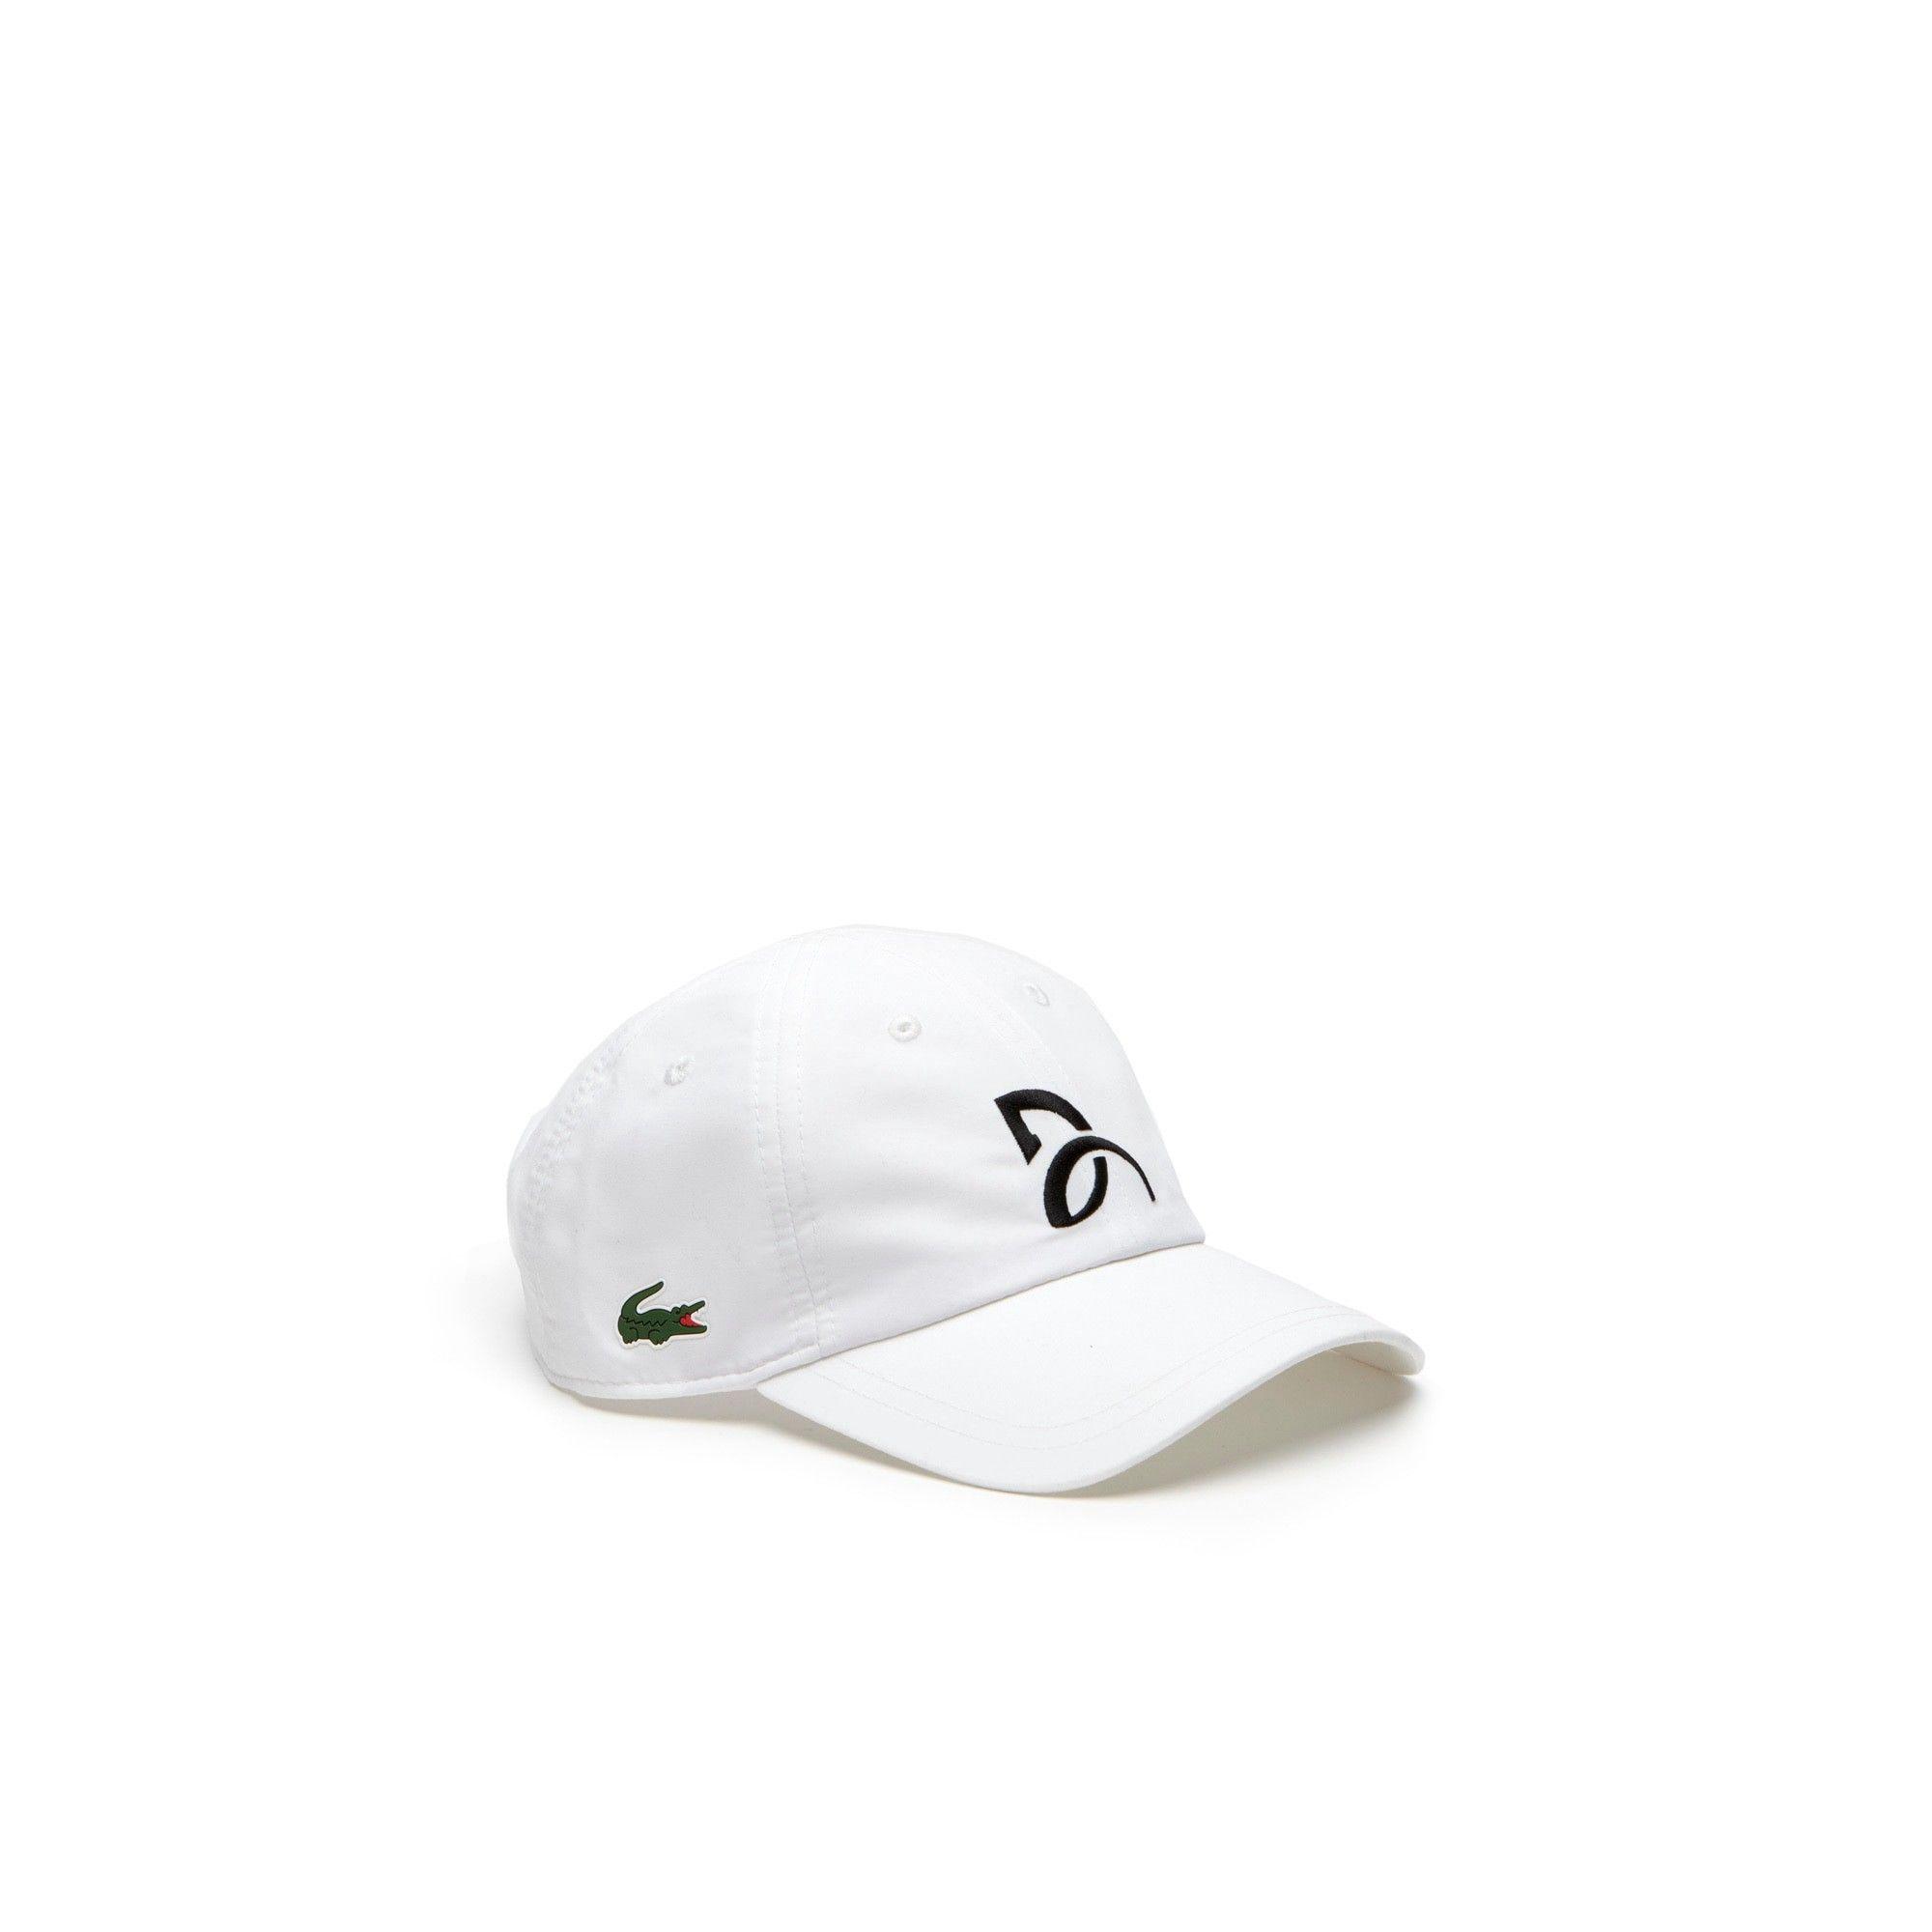 b29fece6d3ab60 LACOSTE Men s Lacoste SPORT Tennis Novak Djokovic Logo Microfiber Cap -  white.  lacoste  cloth